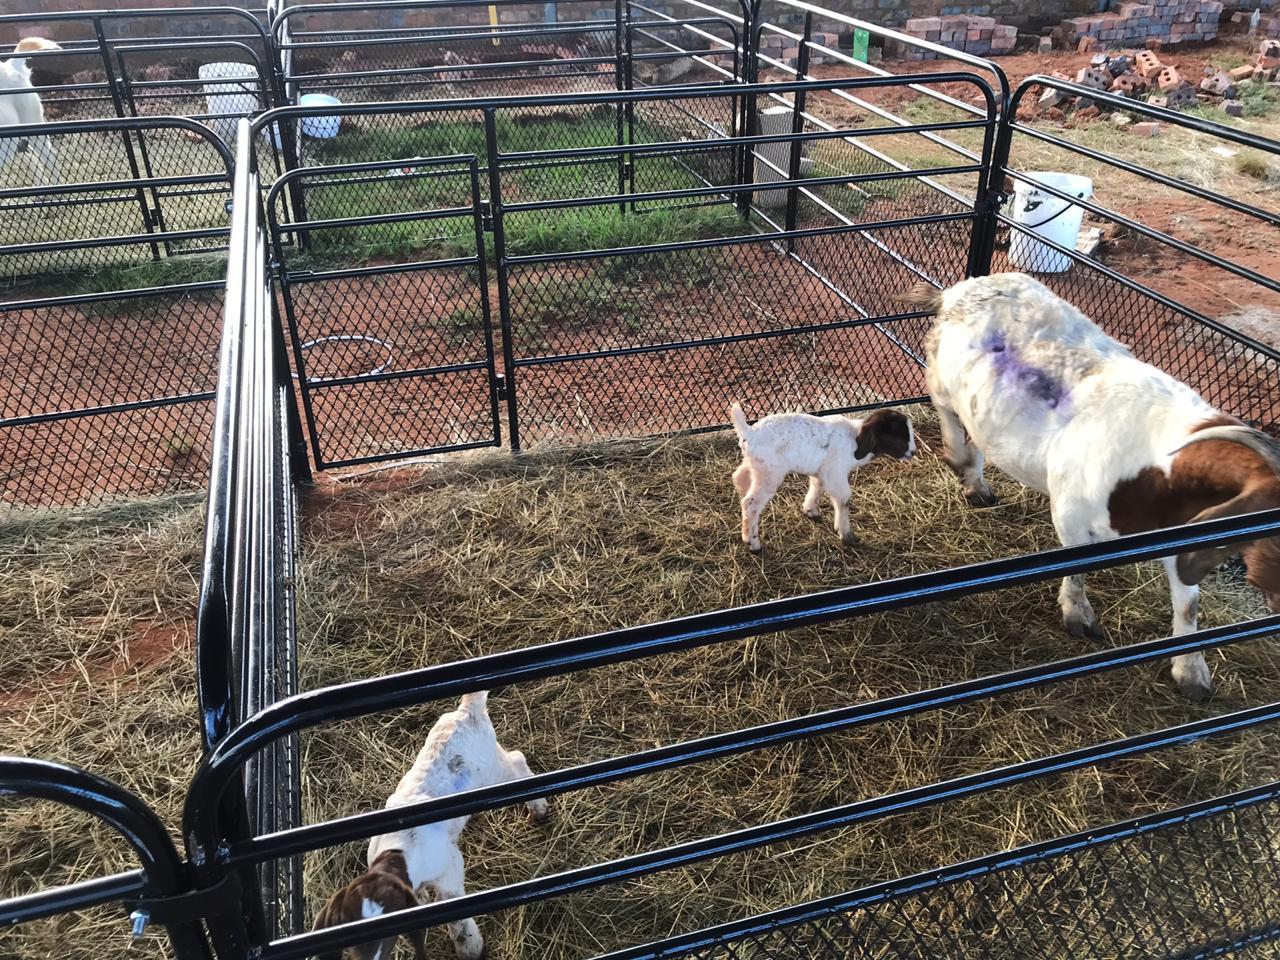 Cattle , goats and sheep steel handling equipment